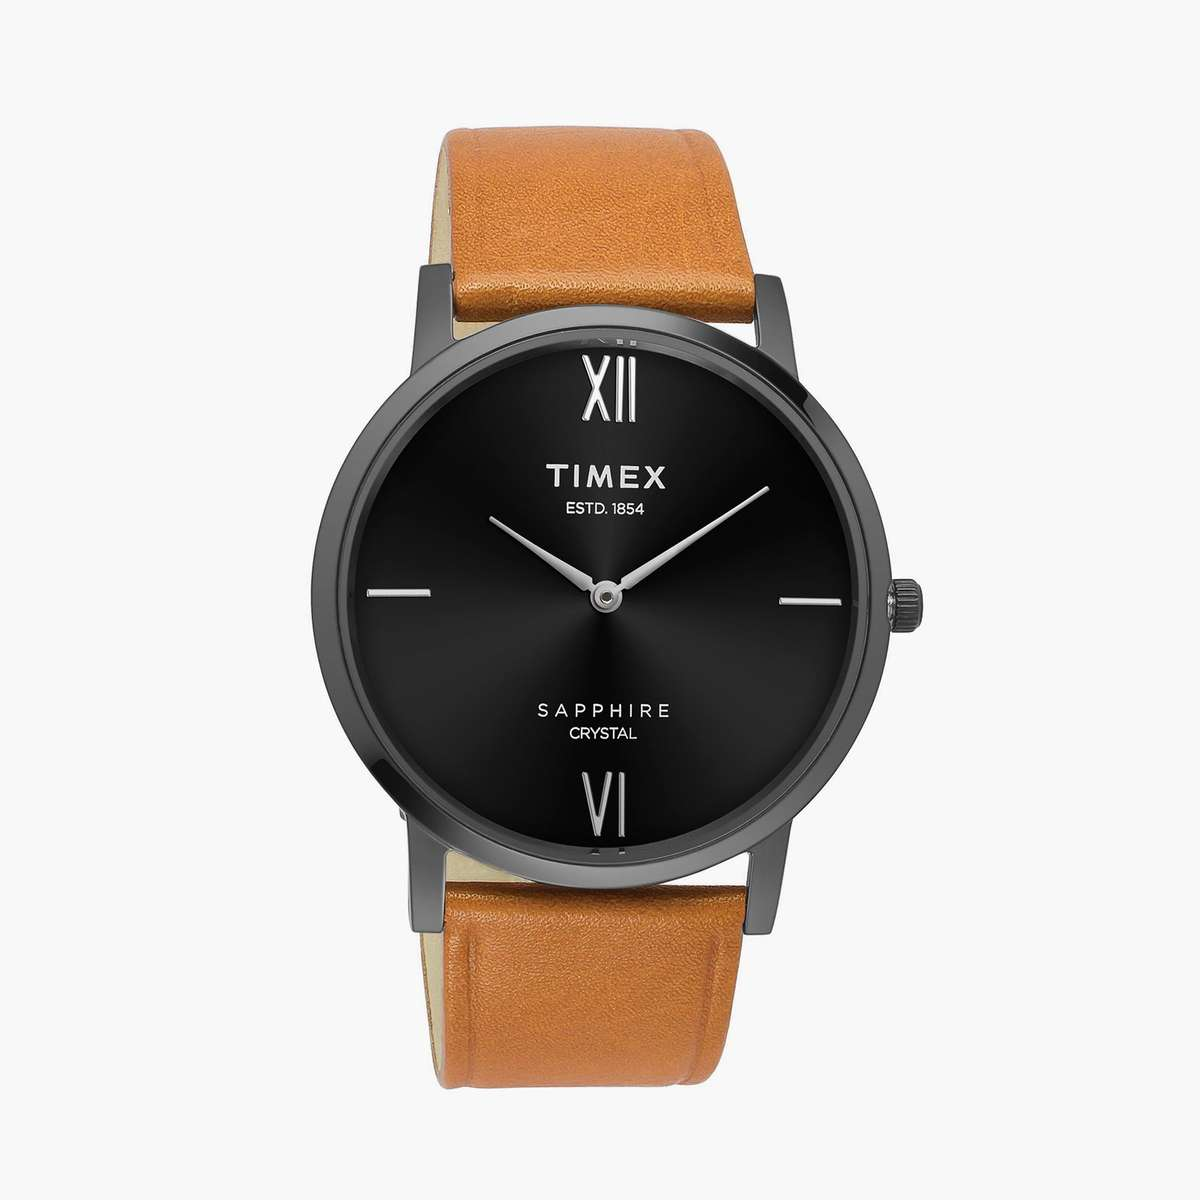 TIMEX Men Analog Watch with Leather Strap- TWEG17408